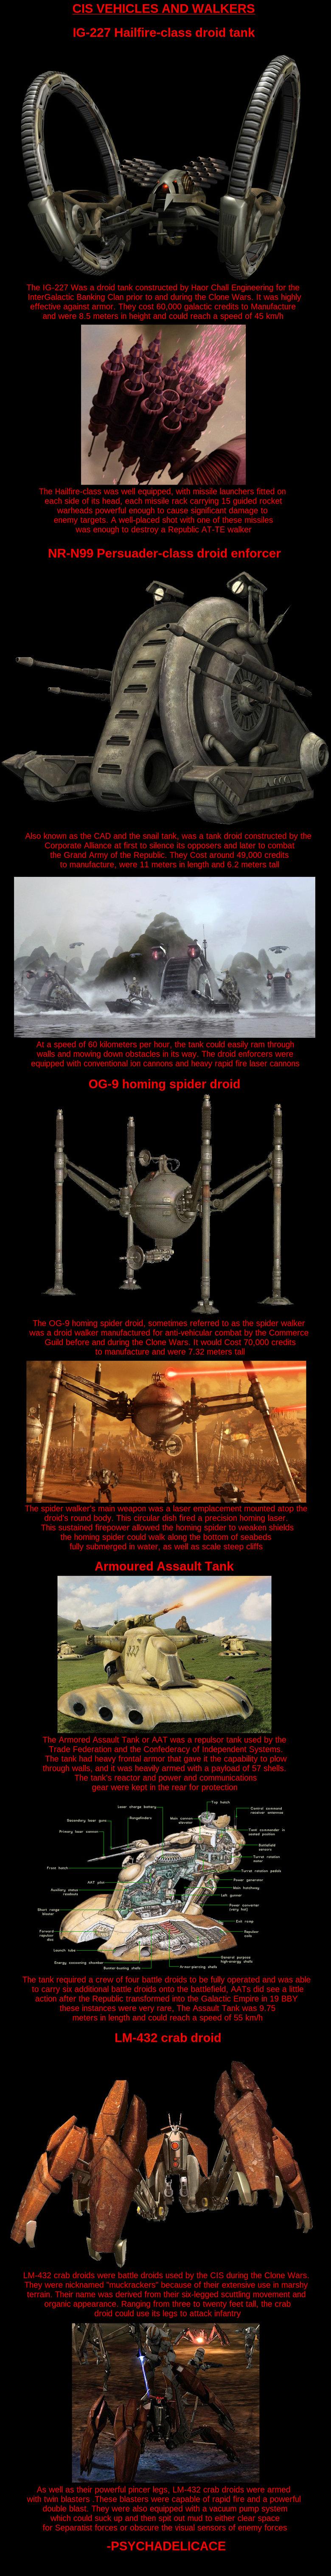 Droid Walkers. .. those ...enforcer droids in BFII, man... kashyyyk, man...just...Jesus man!